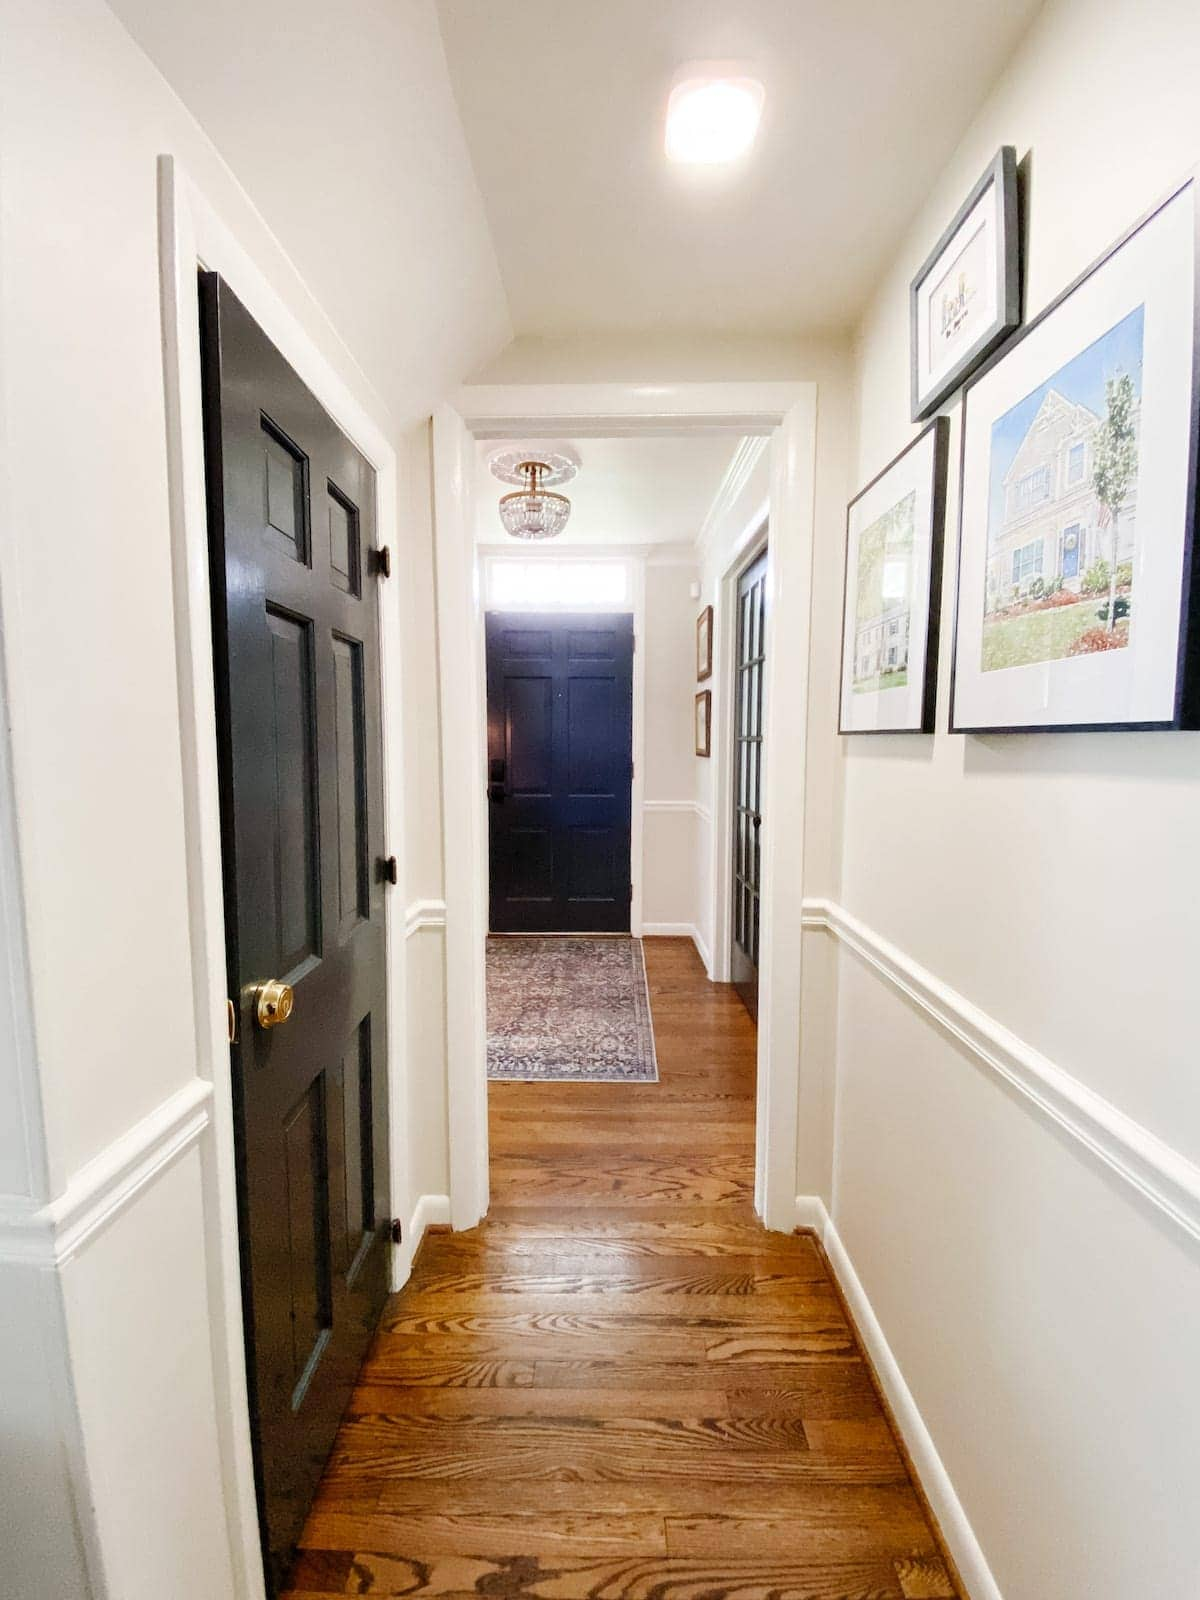 Motion sensor light in a hallway for closet access